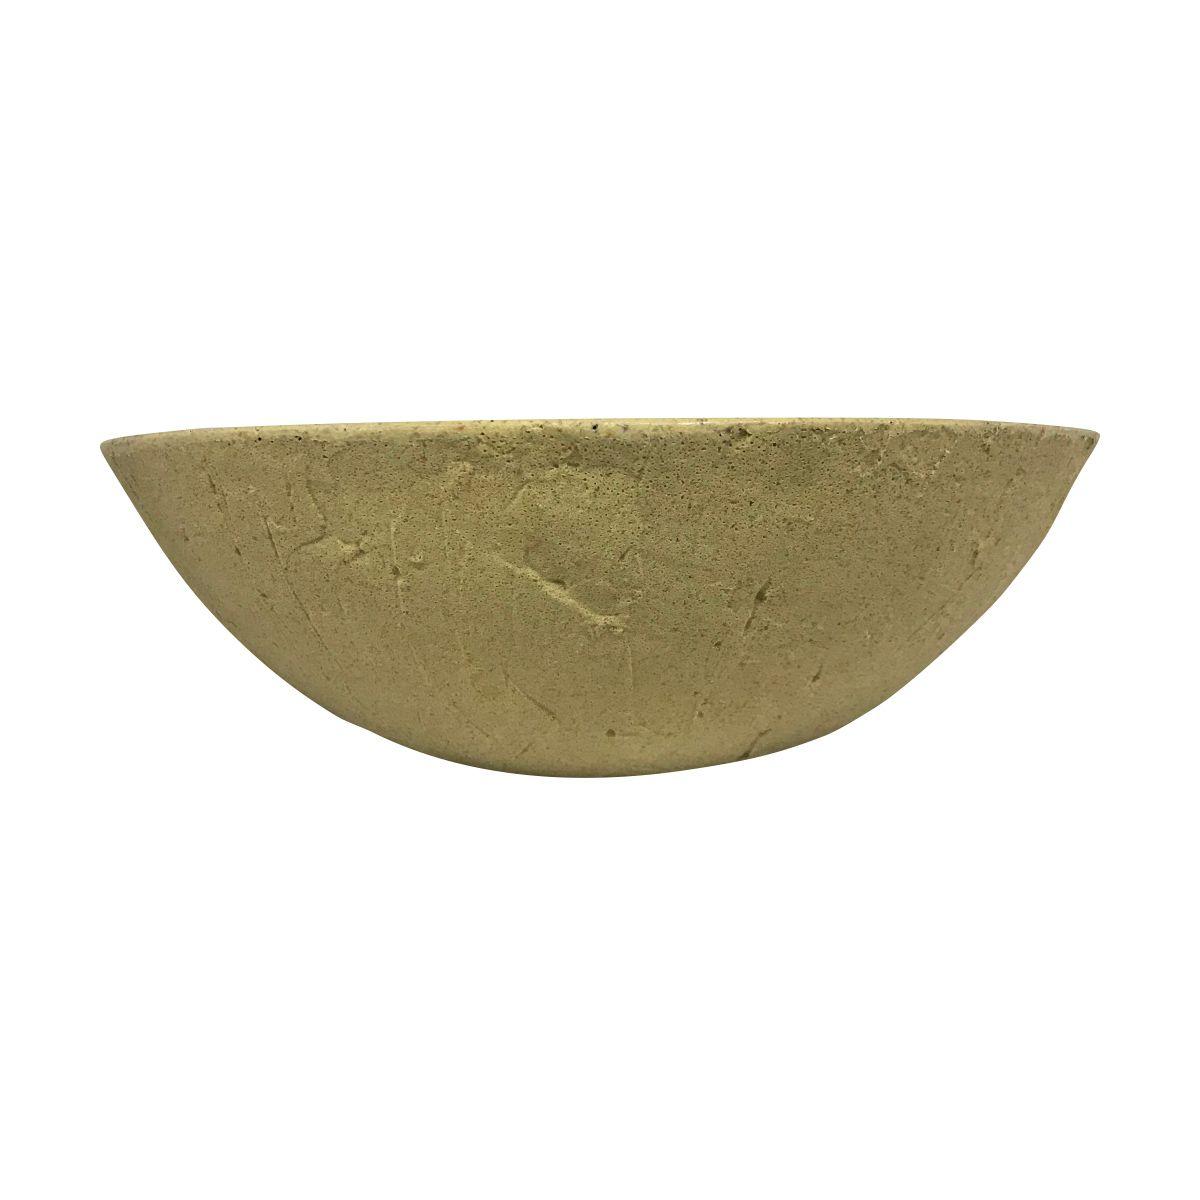 Vaso Bacia Rústica Pequeno cor Areia Claro 12cm x 35cm